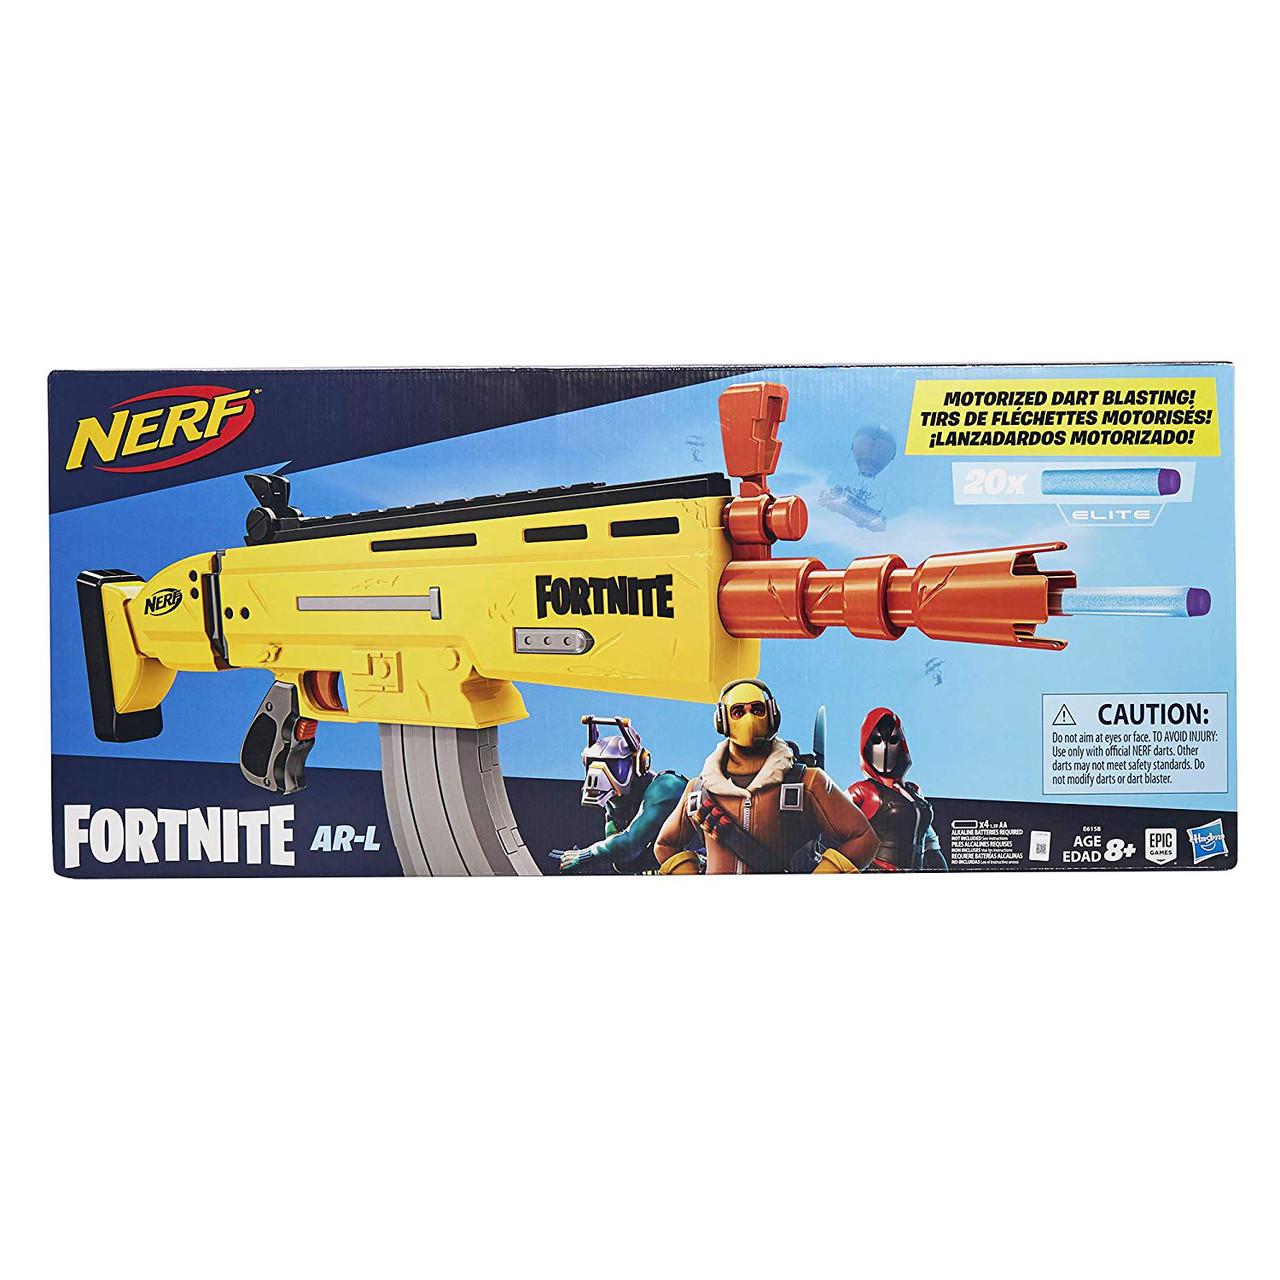 Нёрф фортнайт Nerf fortnite Спрингер - фото 1